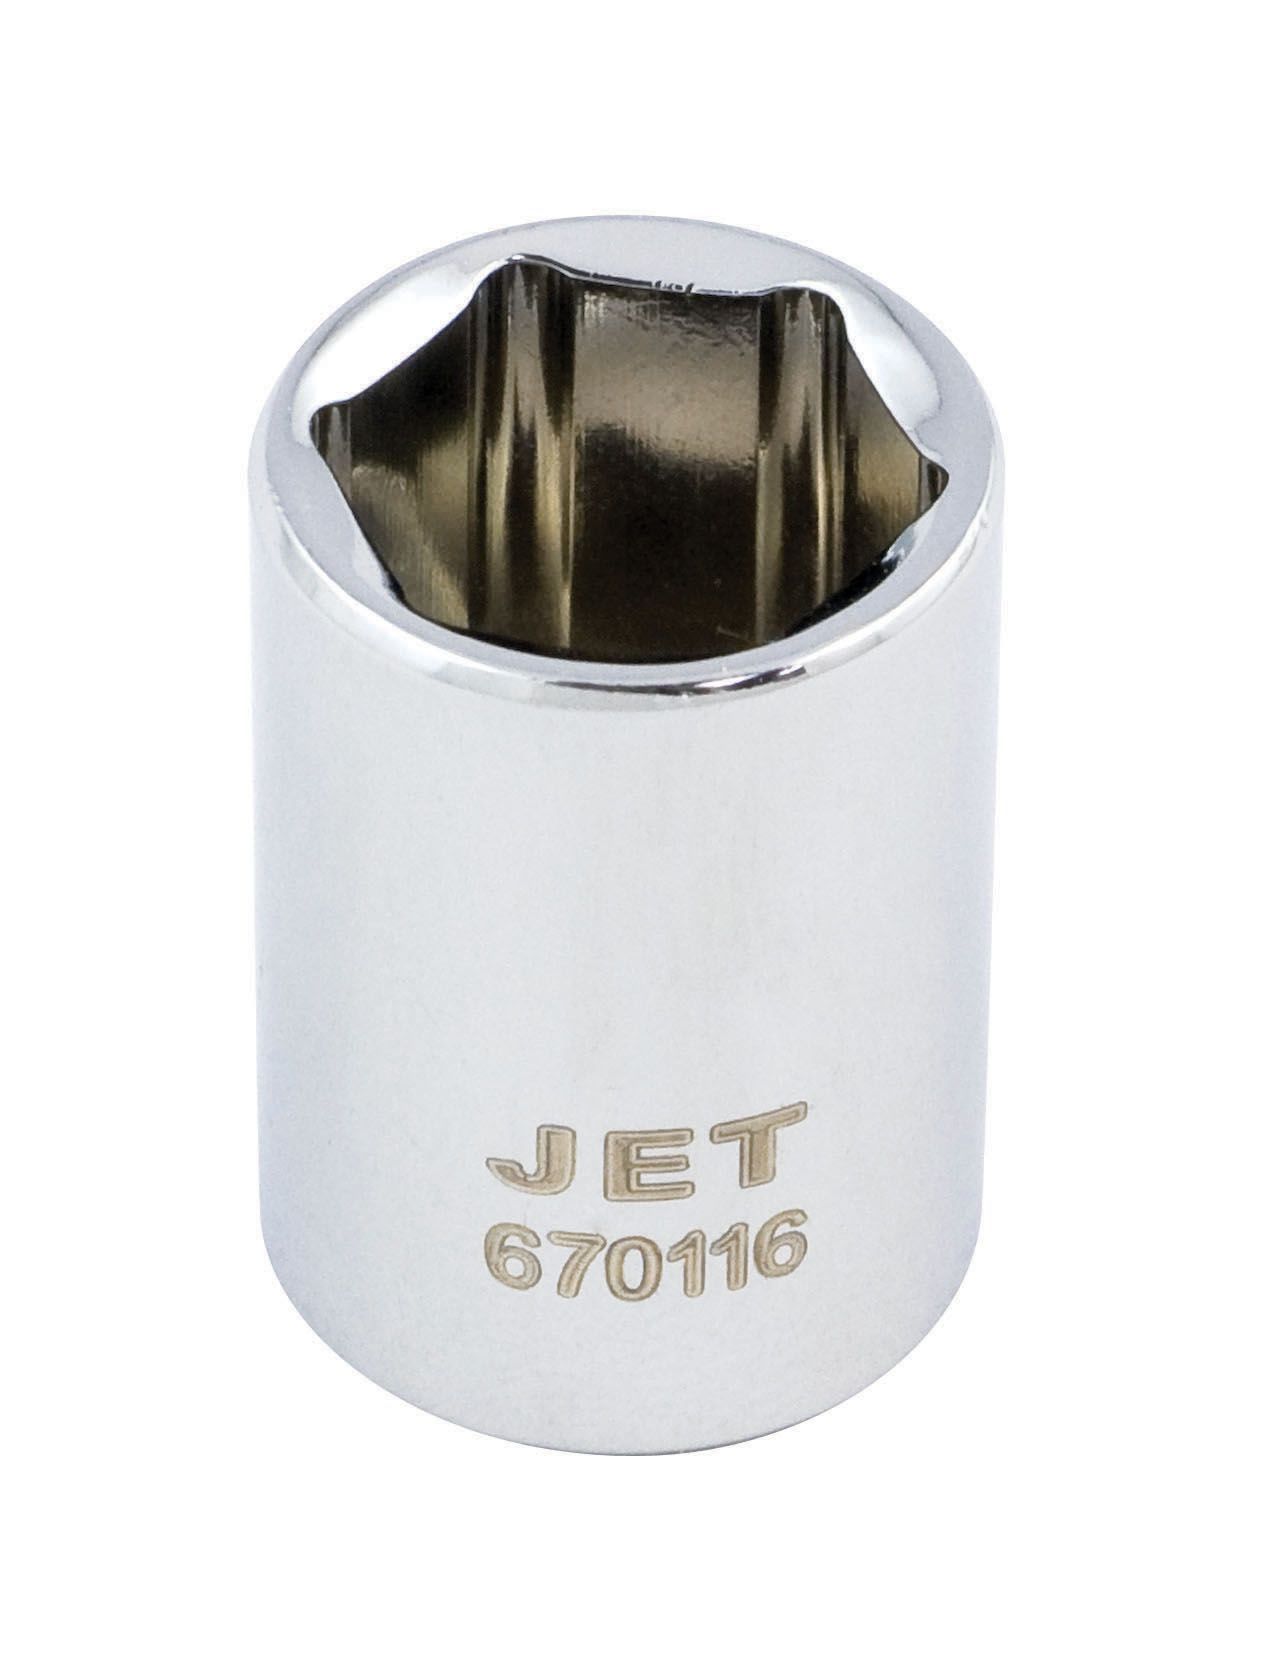 Jet 670112 Douille 3/8